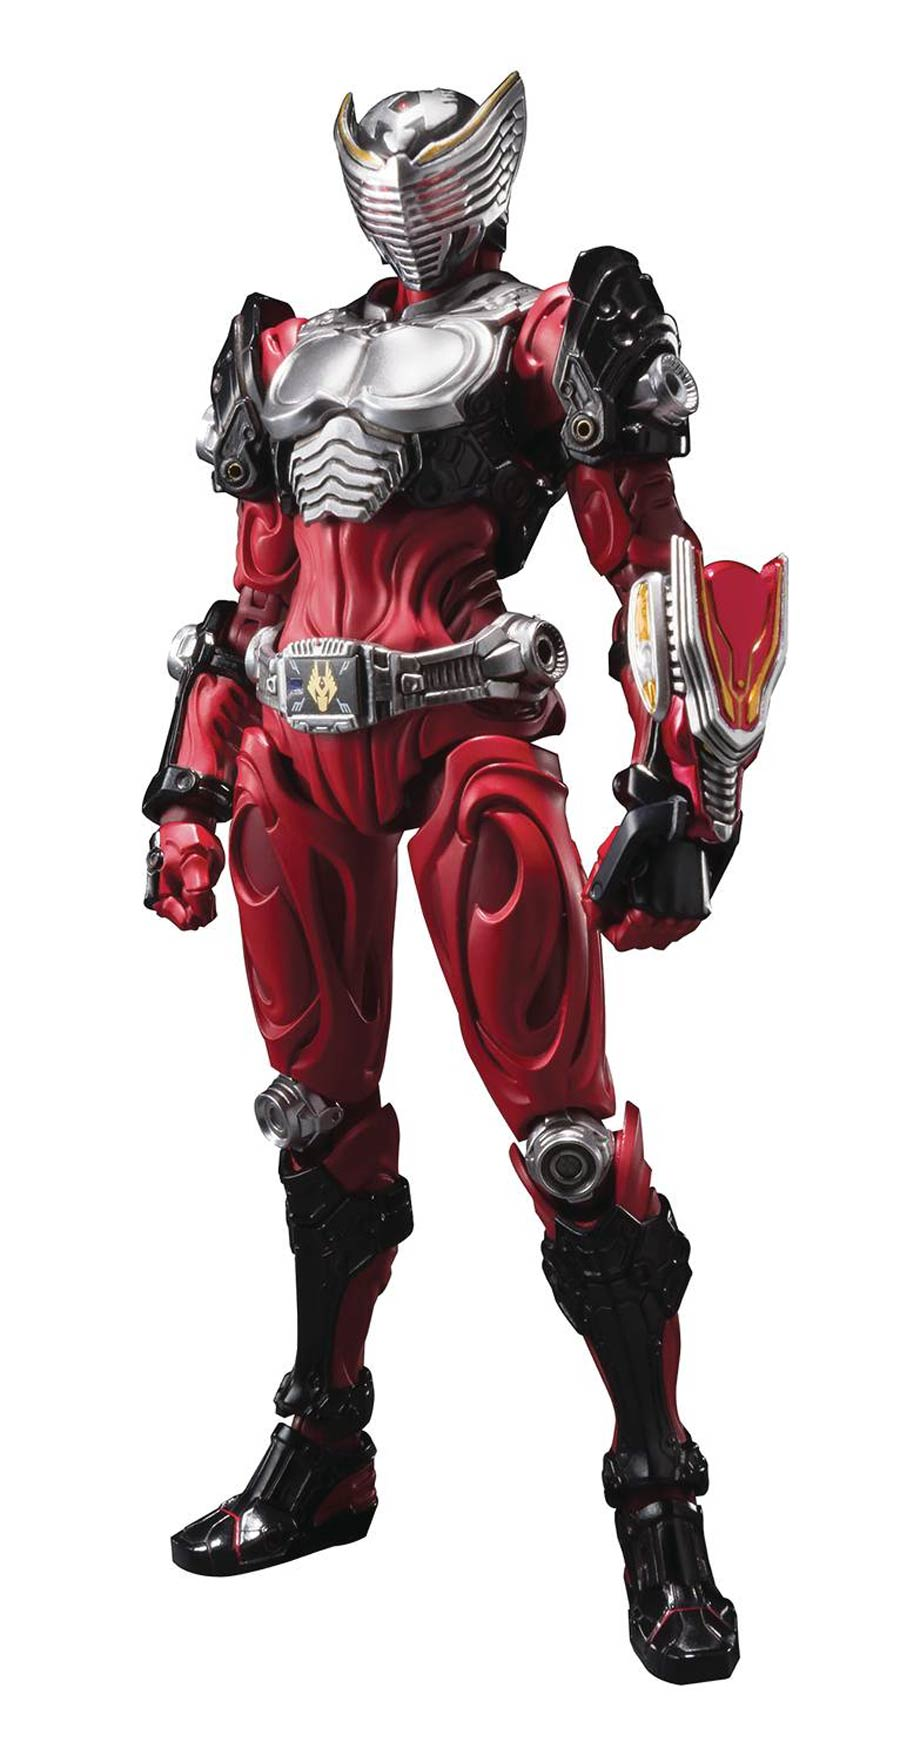 Kamen Rider S.I.C. Super Imaginative Colosseum - Masked Rider Ryuki Action Figure